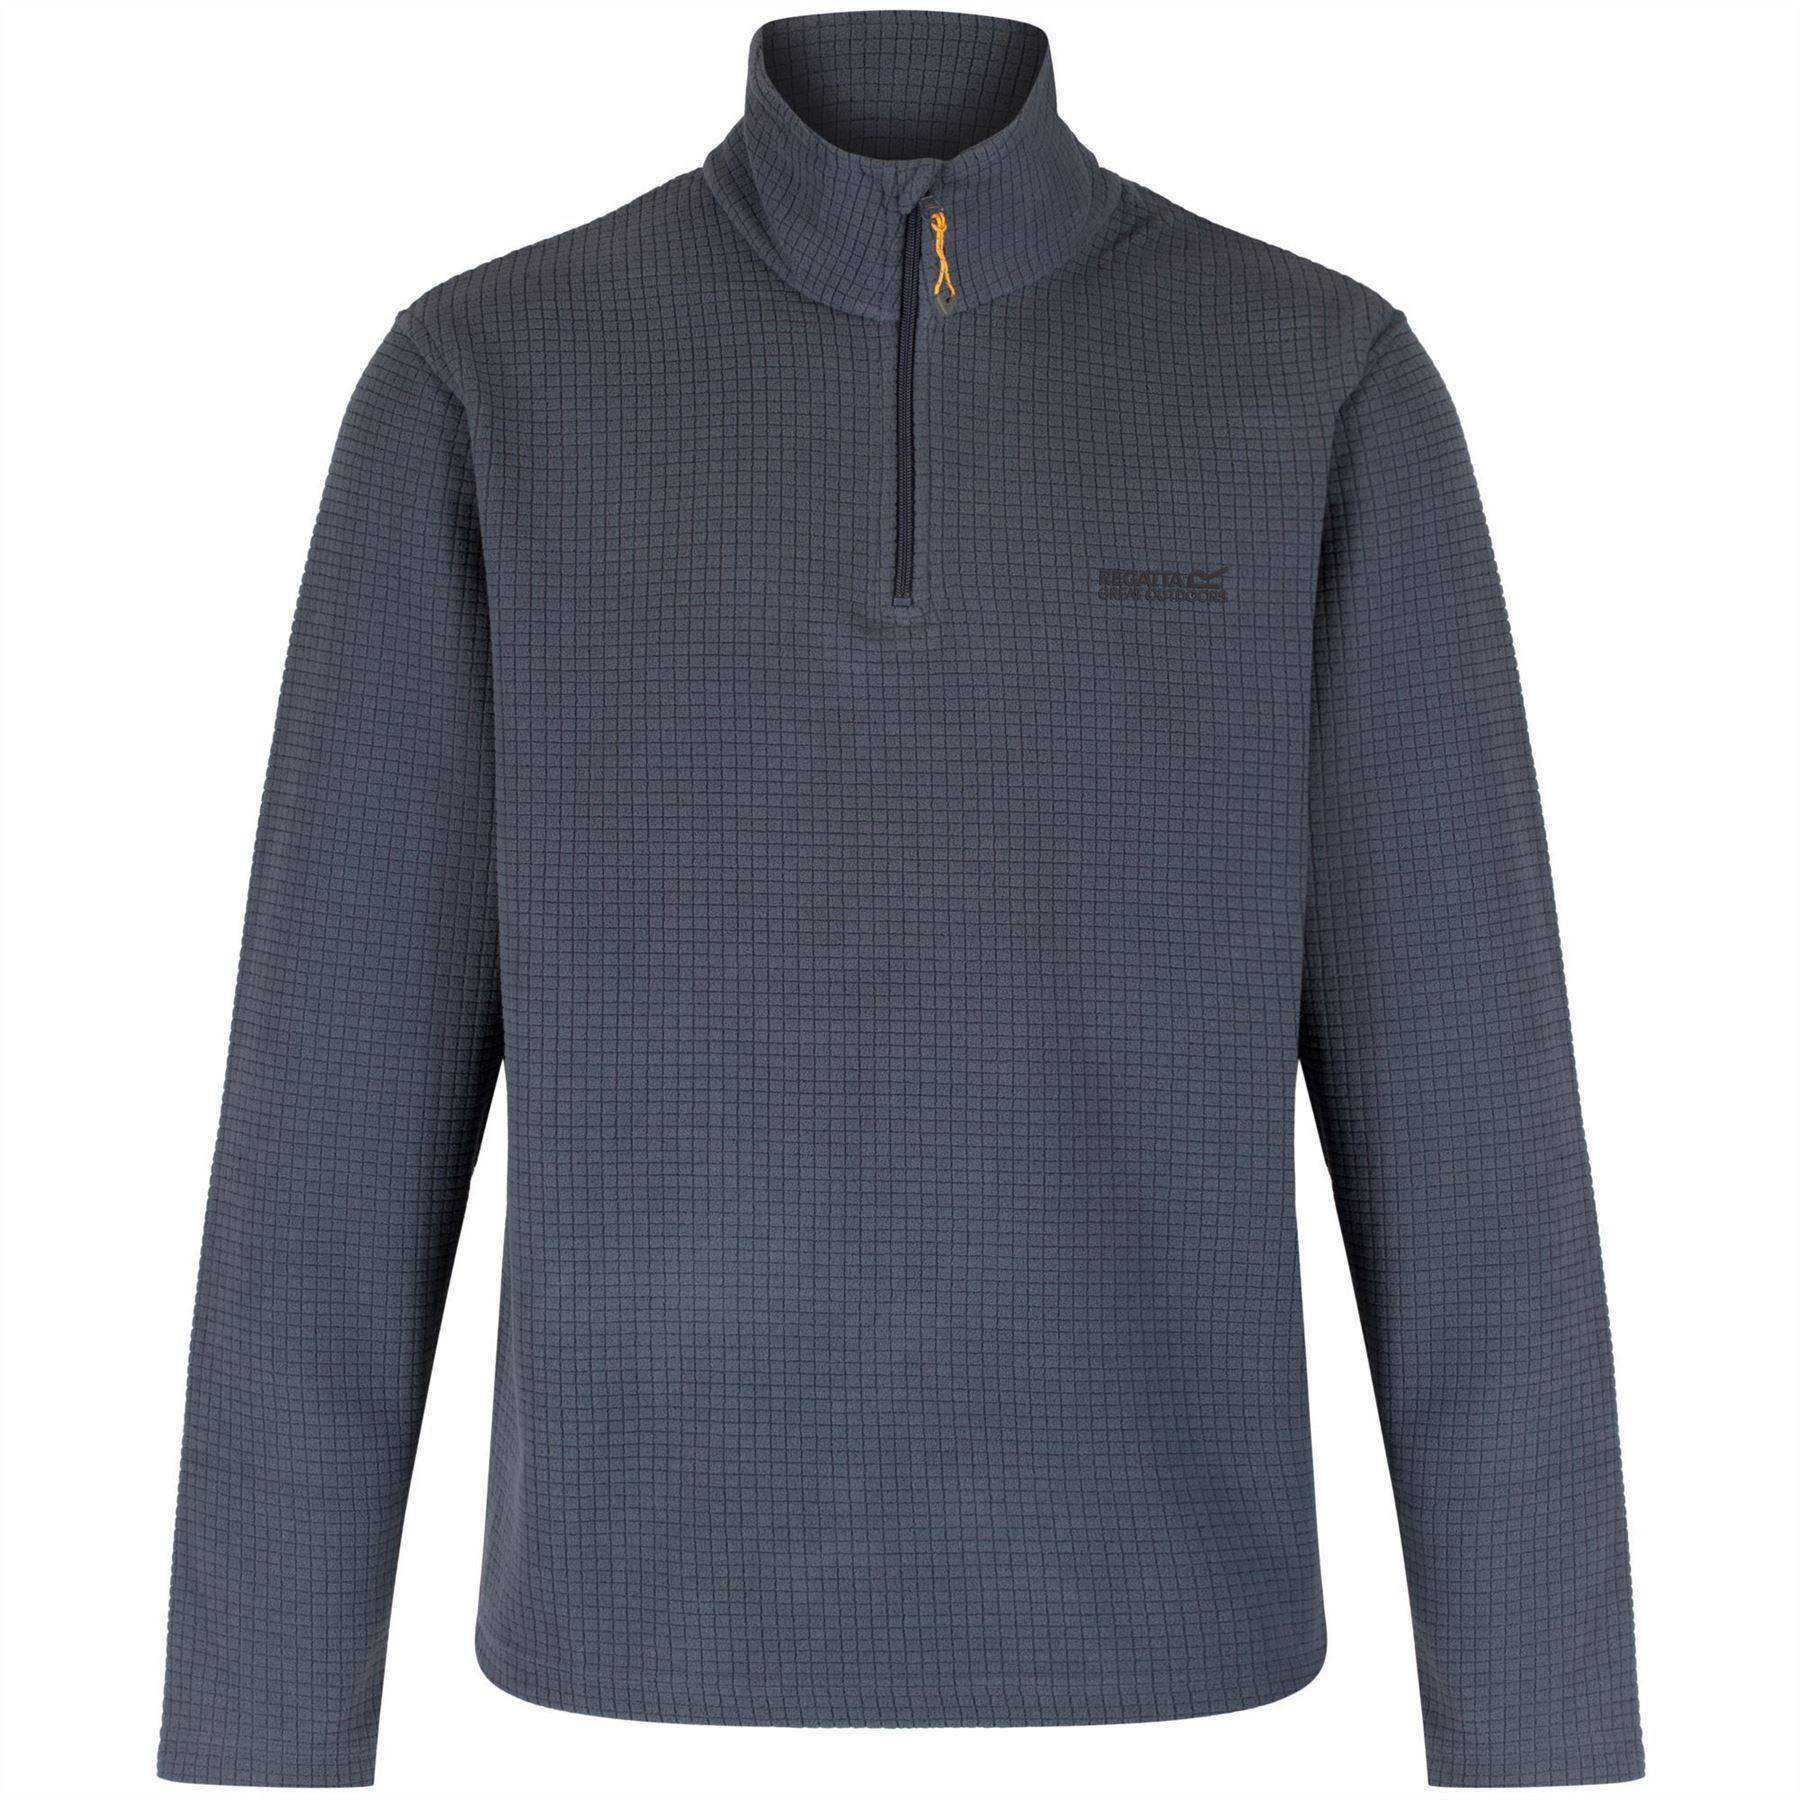 Regatta-Zona-para-Hombre-Chaqueta-Top-Half-Zip-Fleece-Pullover-RMA236